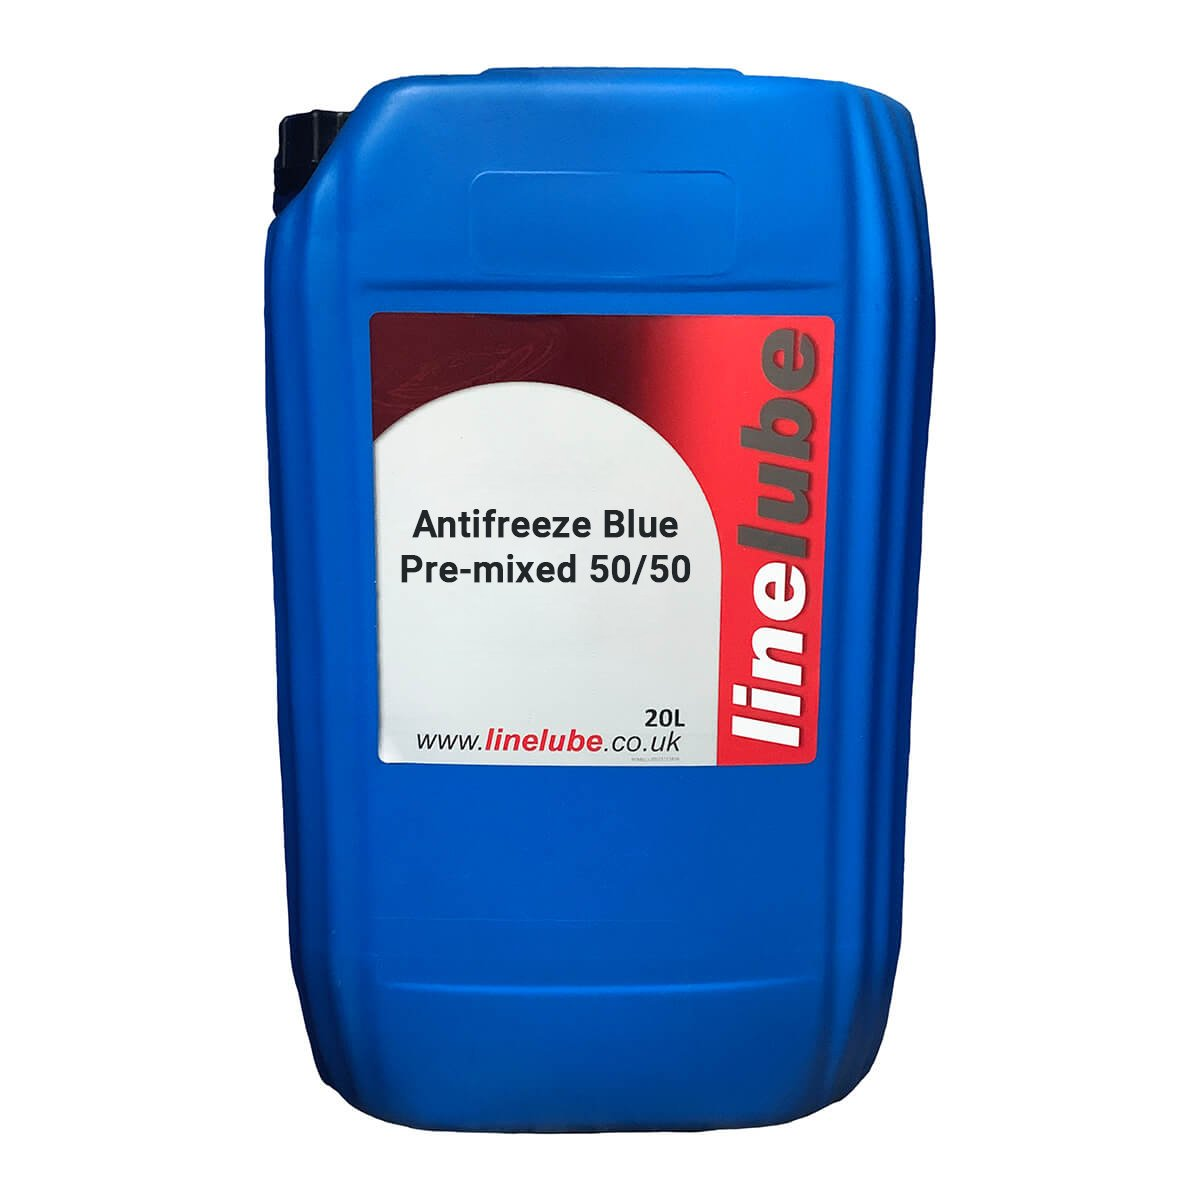 Linelube Antifreeze Blue Pre-mixed 50/50